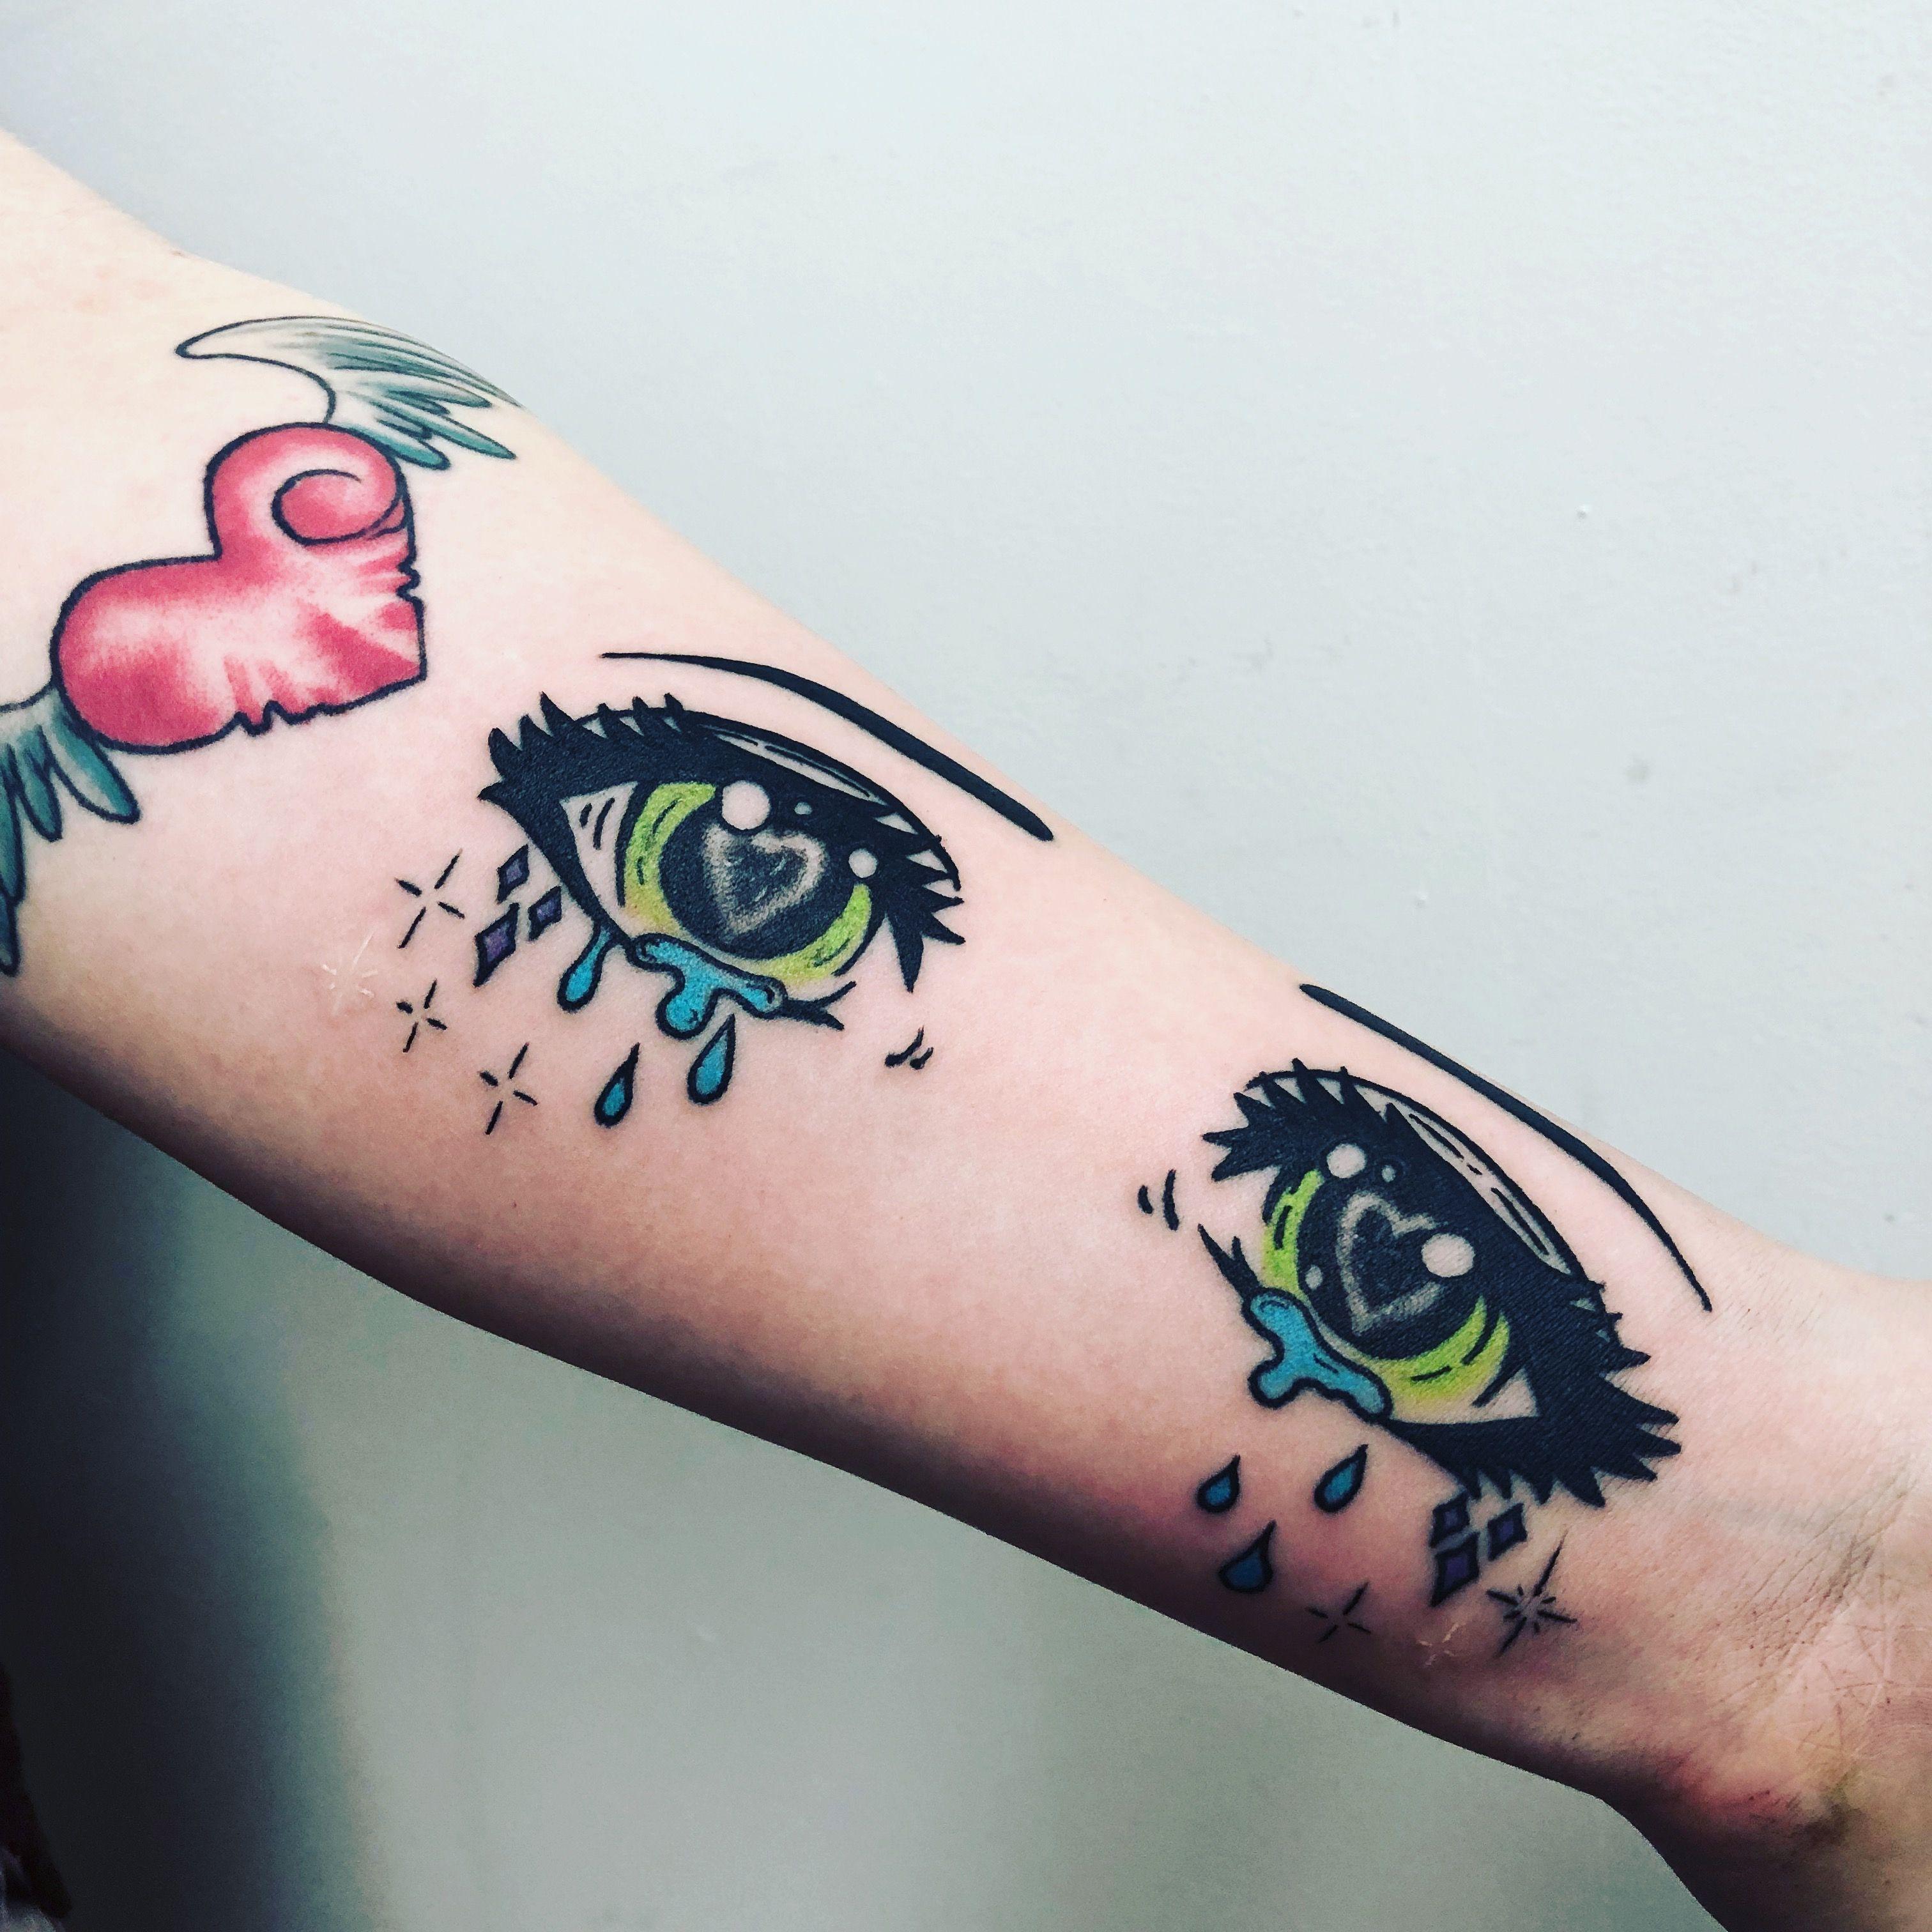 Lilxbby 🕊♡ ・゚ Anime tattoos, Kawaii tattoo, Eye tattoo